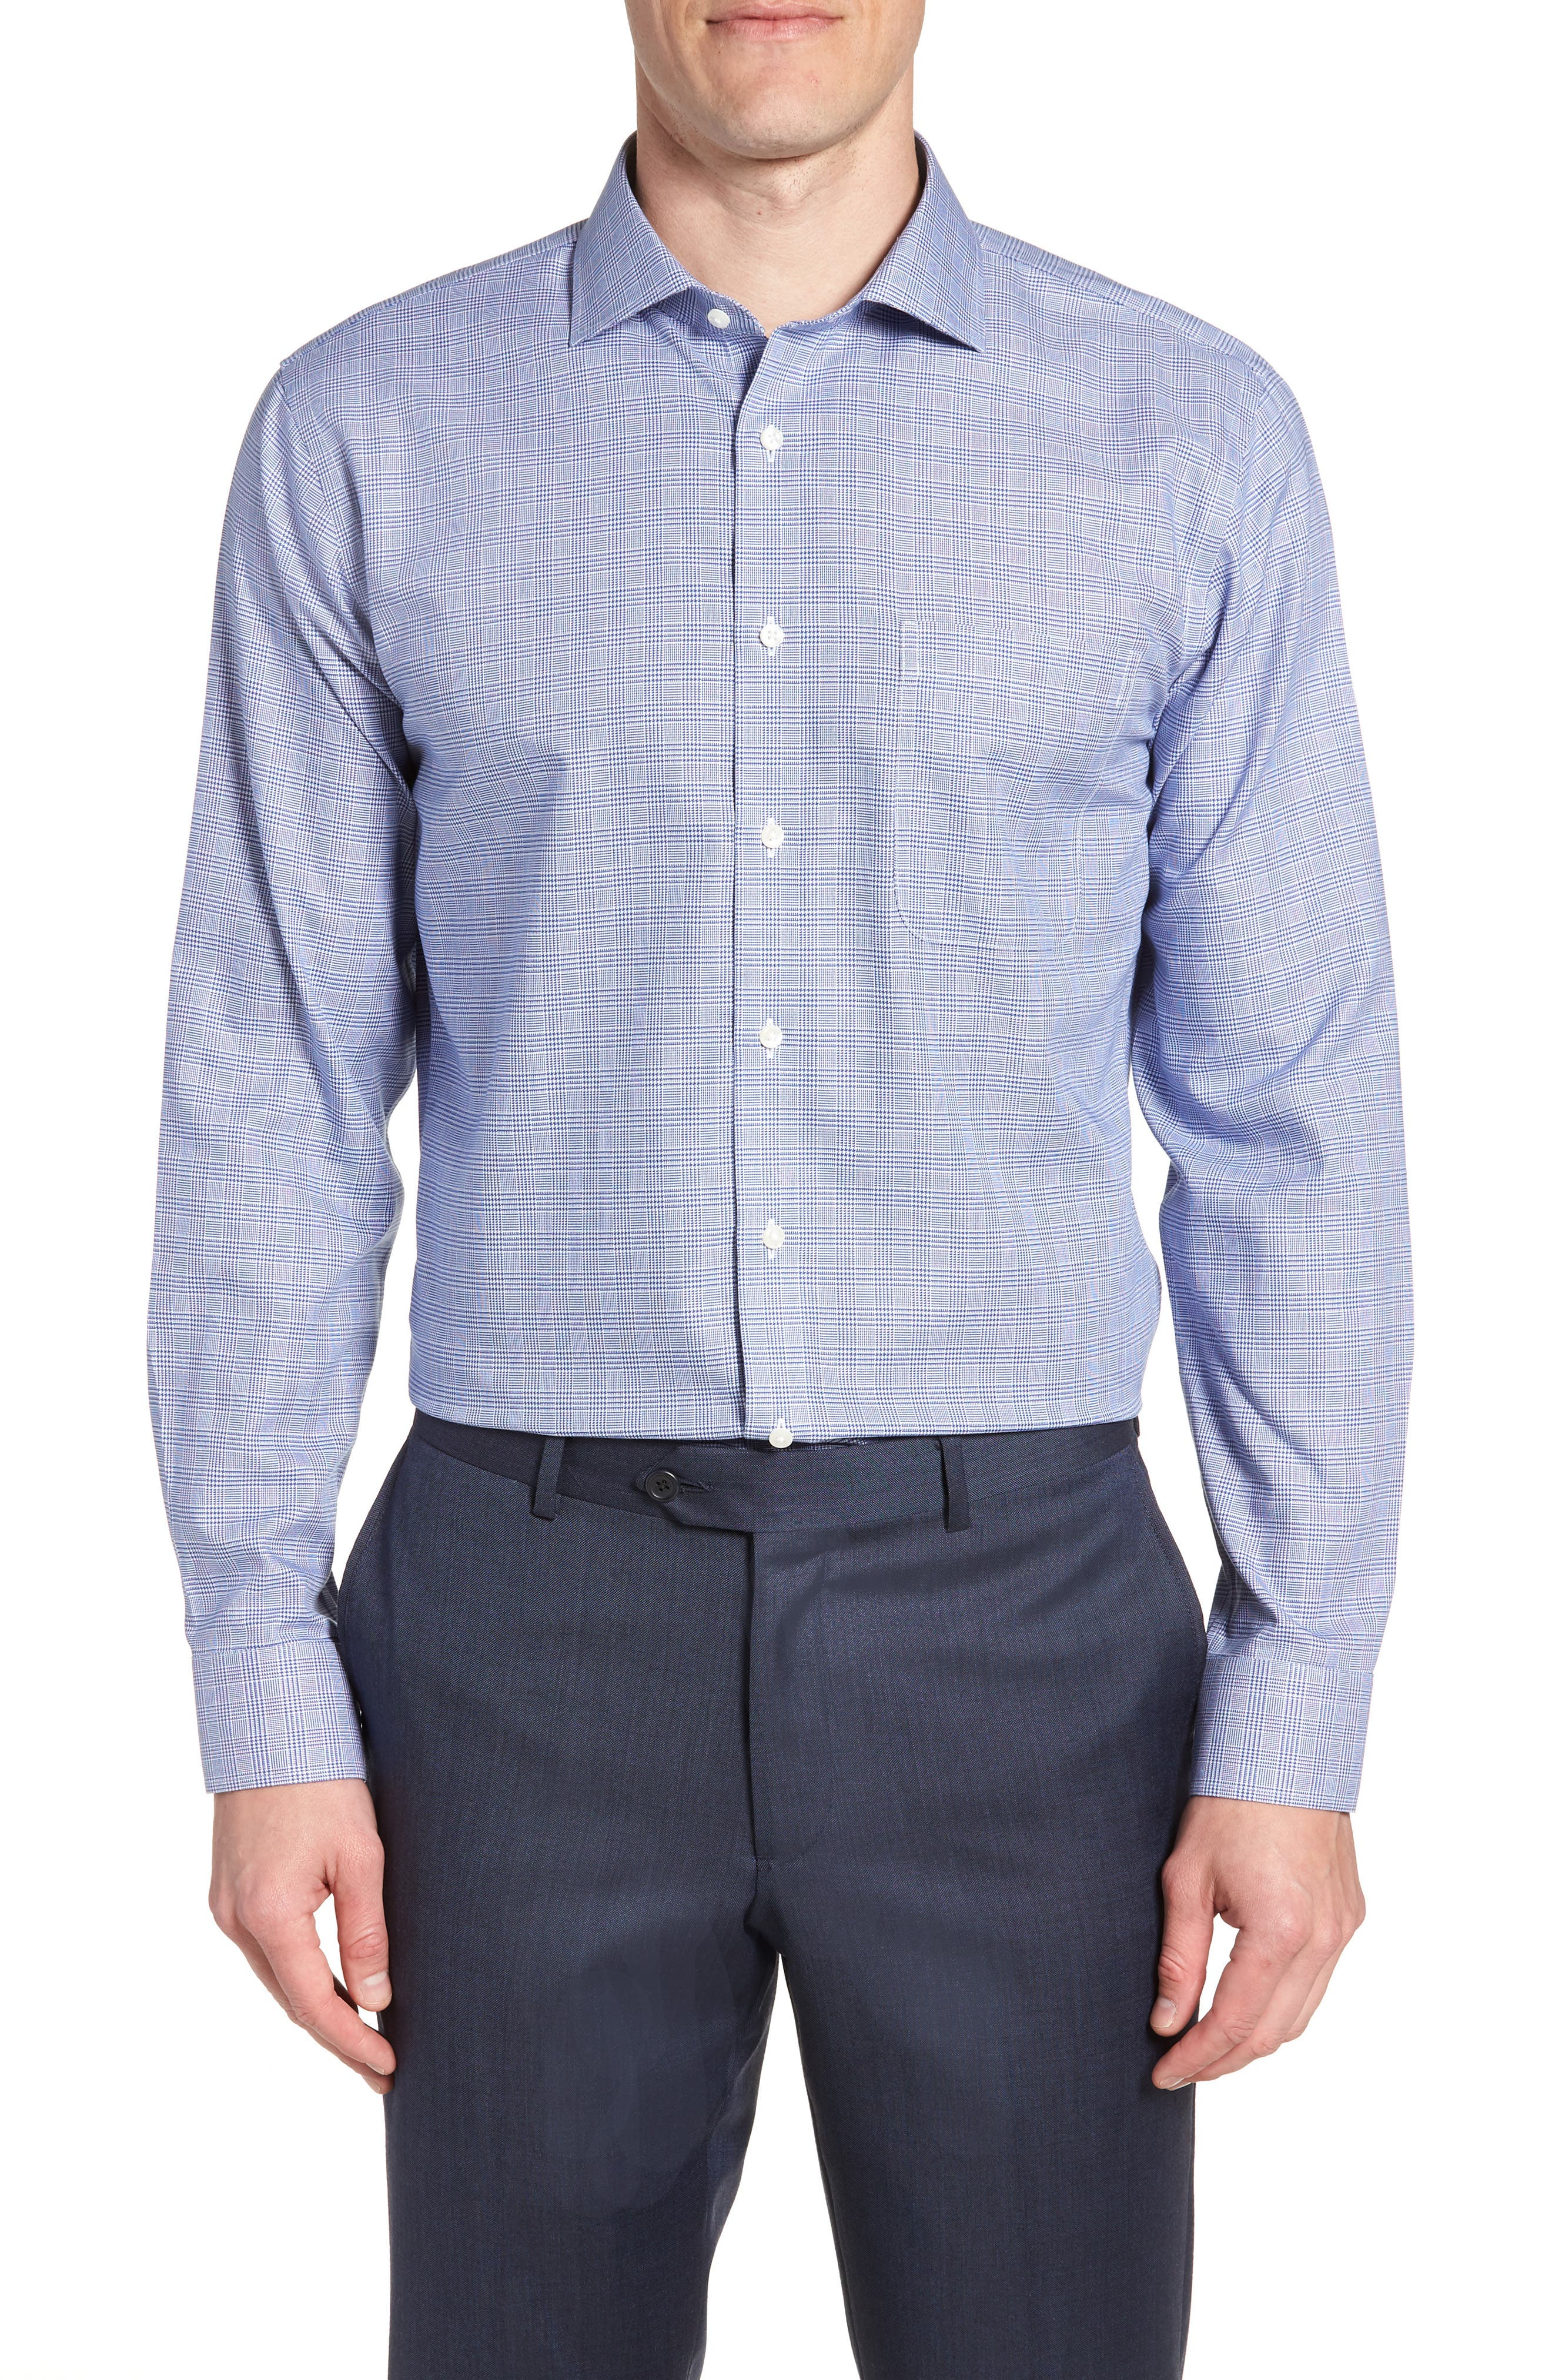 Smartcare<sup>™</sup> Trim Fit Herringbone Dress Shirt,                         Main,                         color, Blue Marine